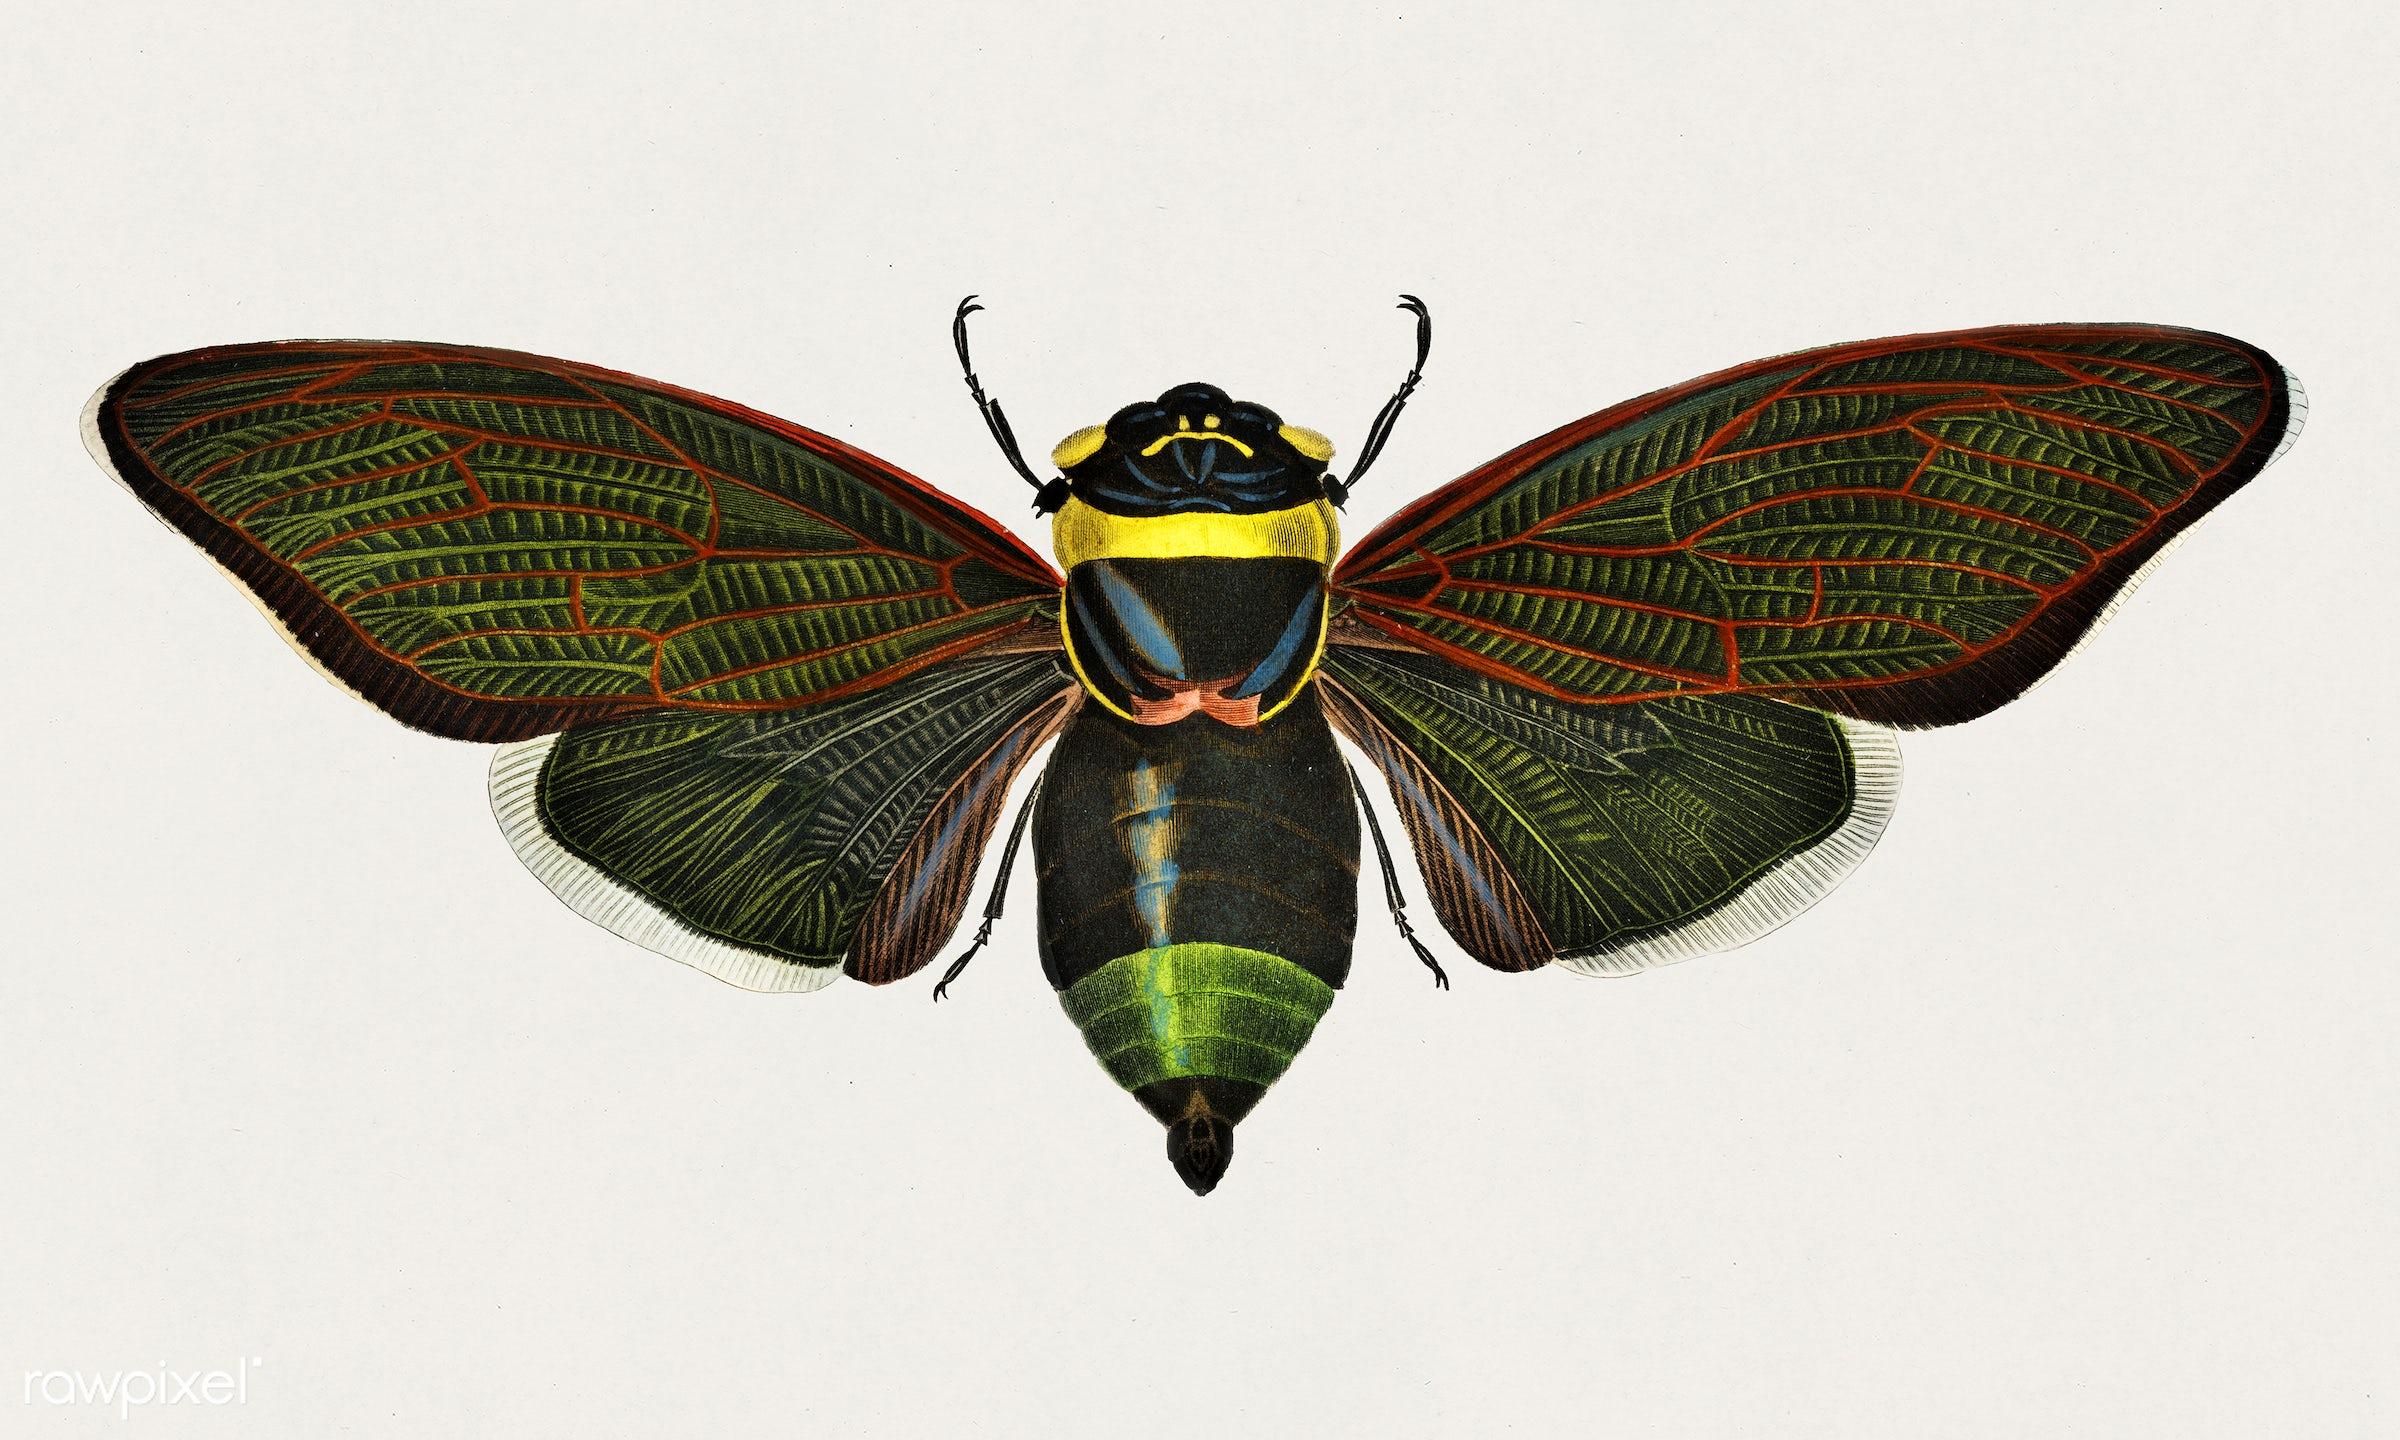 Gian cicada (Cicada speciosa) illustrated by Charles Dessalines D' Orbigny (1806-1876). Digitally enhanced from our own...